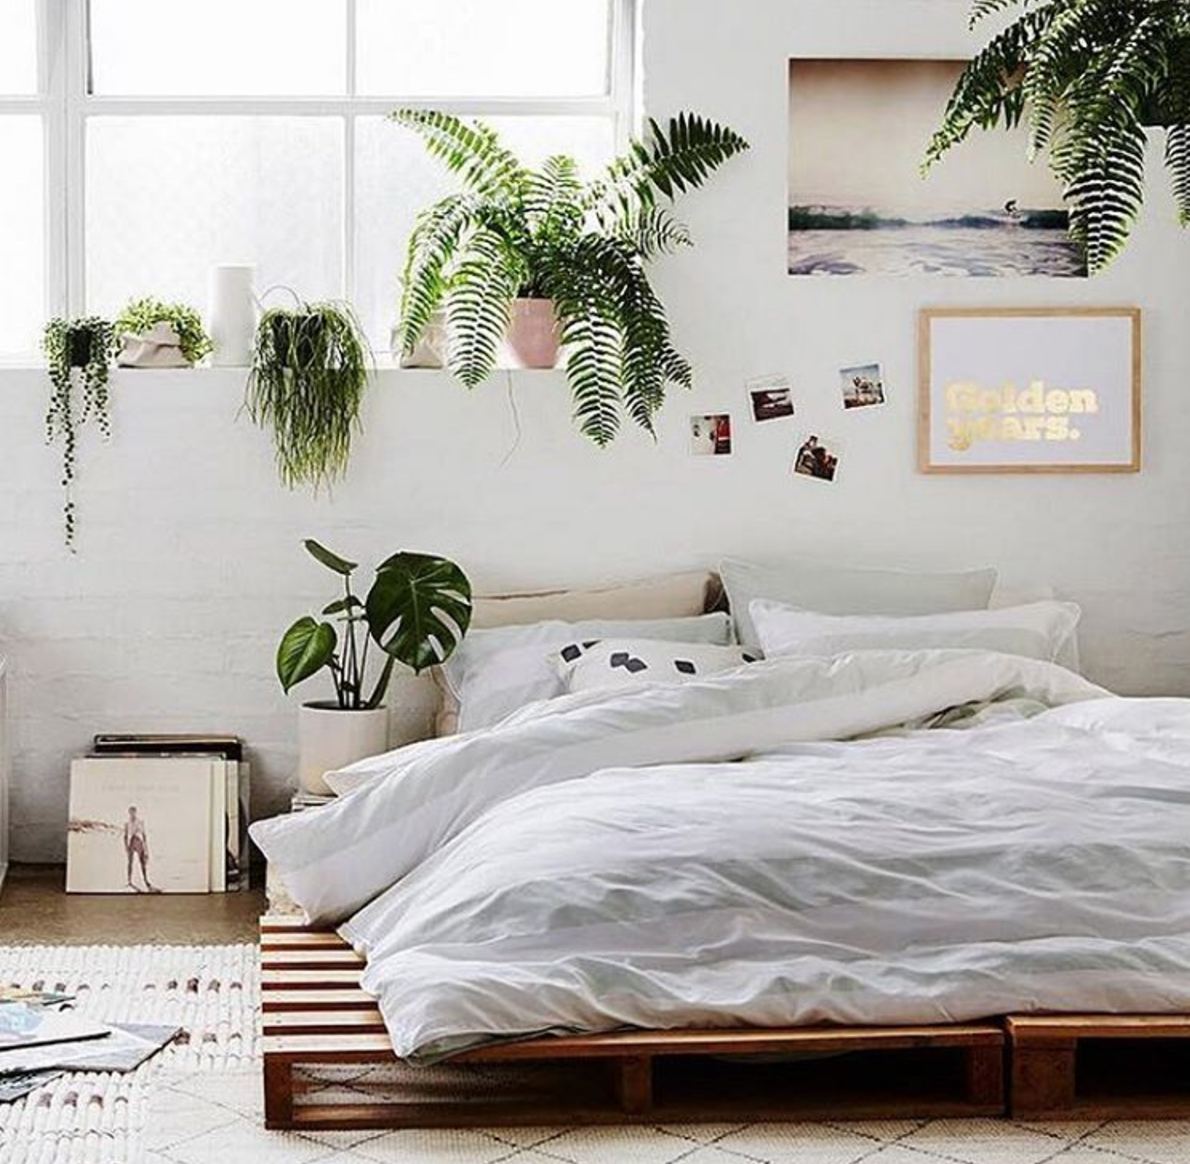 Bohemian Style Bedrooms, White Bedroom